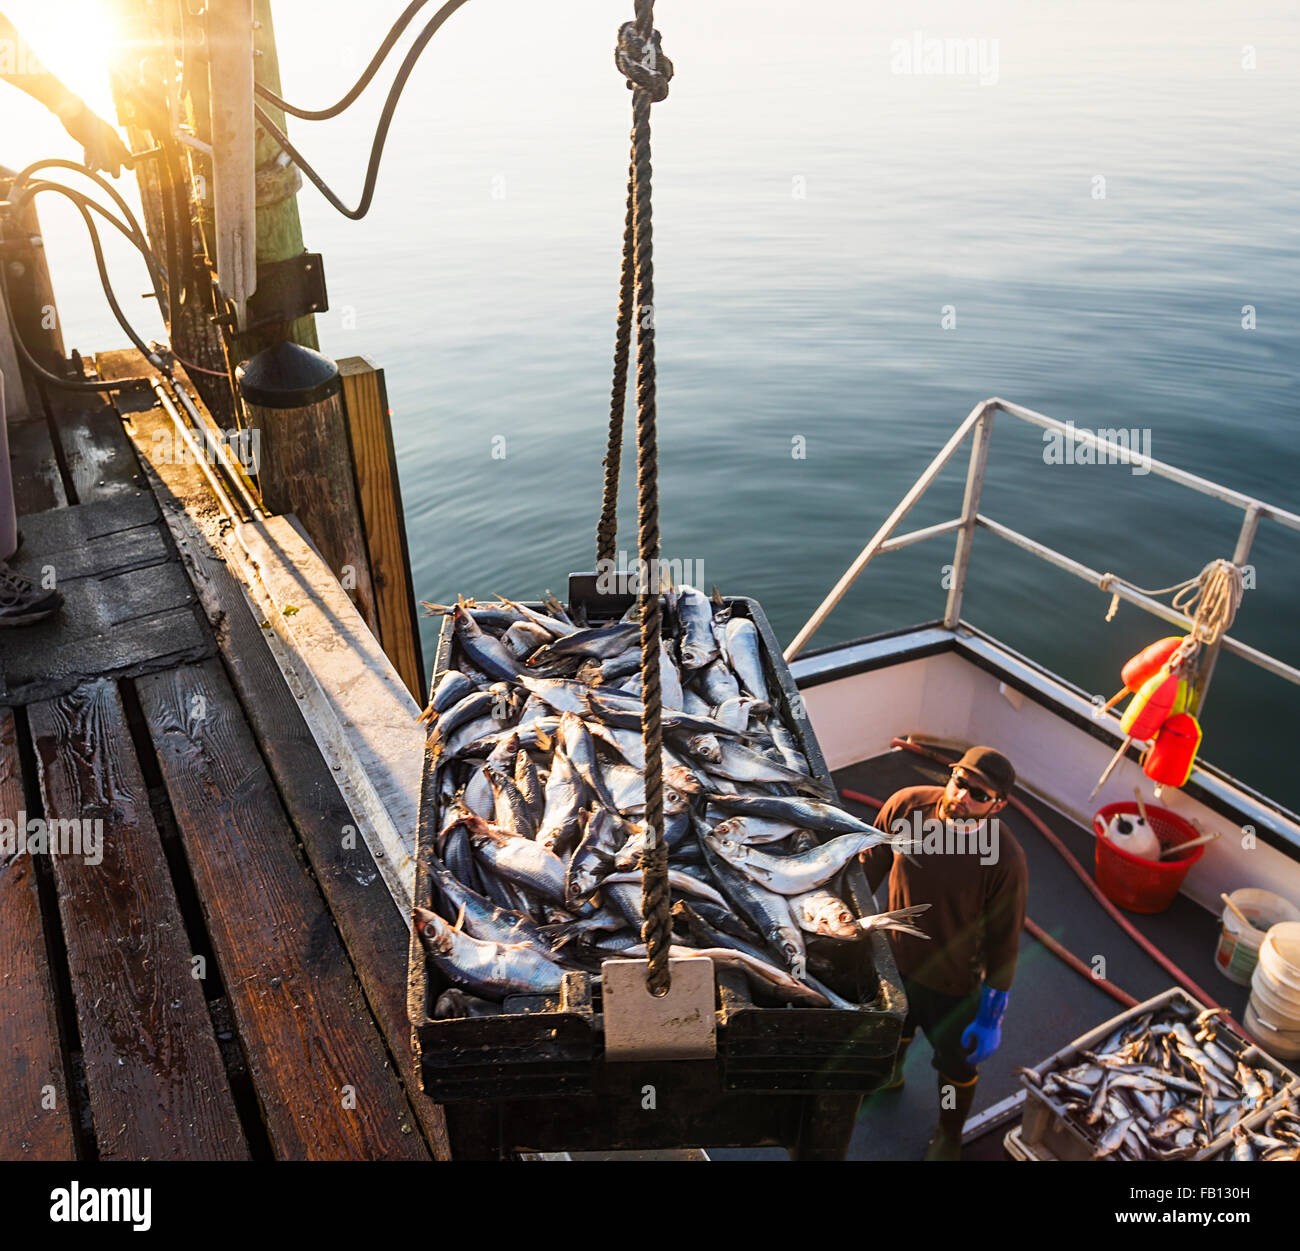 Men loading fish on boat - Stock Image